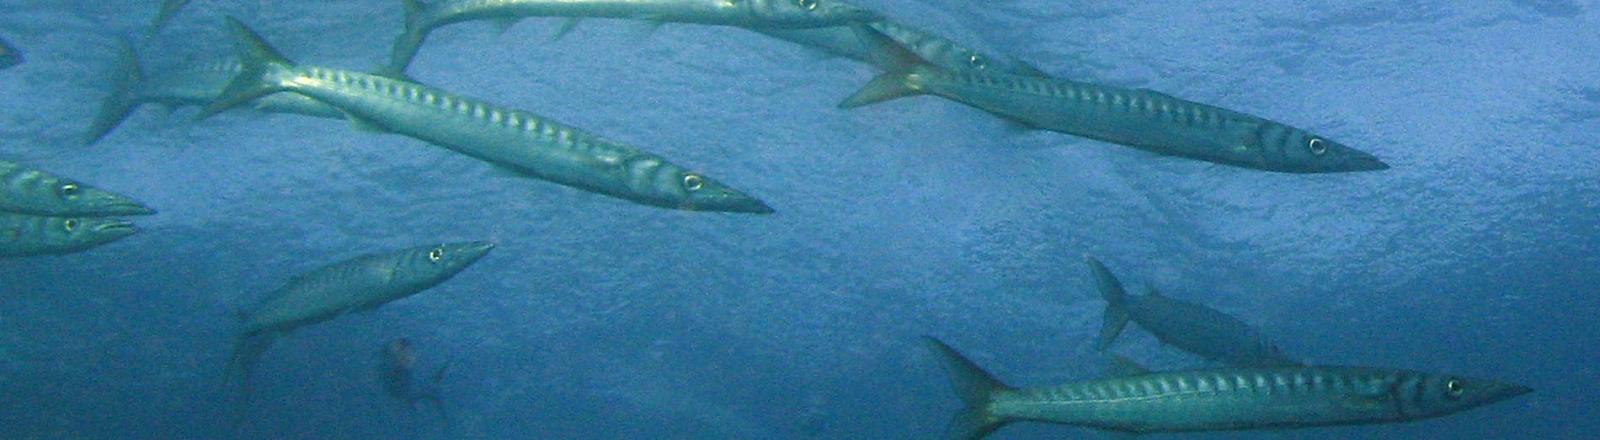 poissons plongée